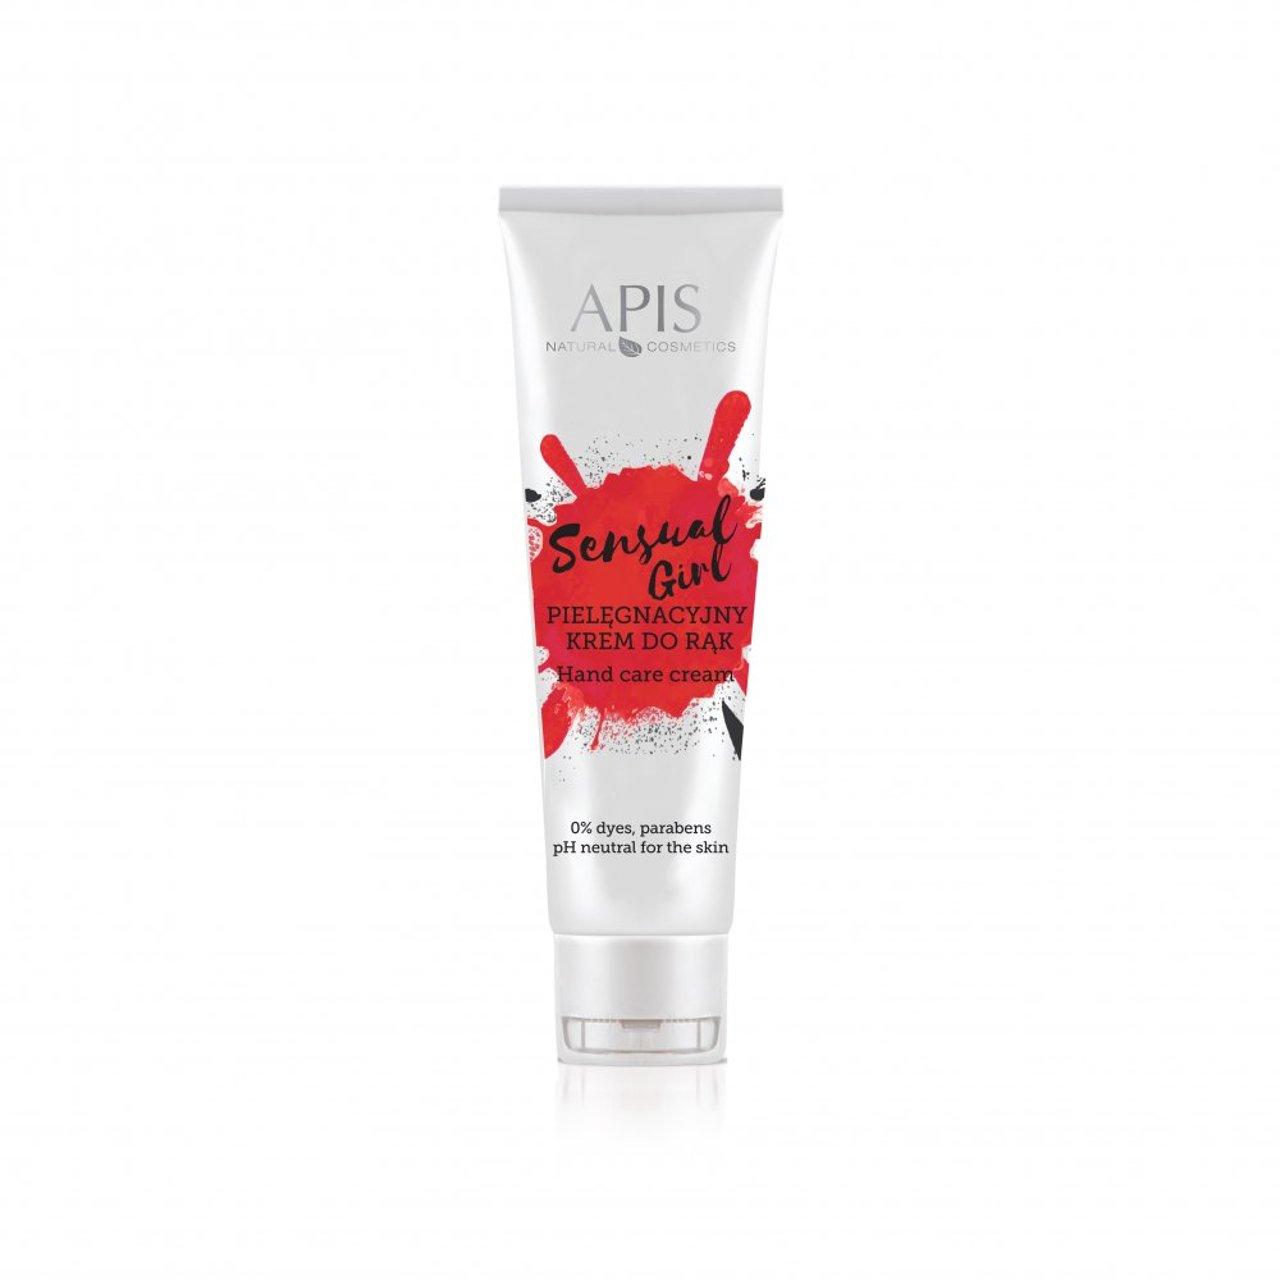 APIS Sensual Girl Perfumowany krem do rąk 100ml